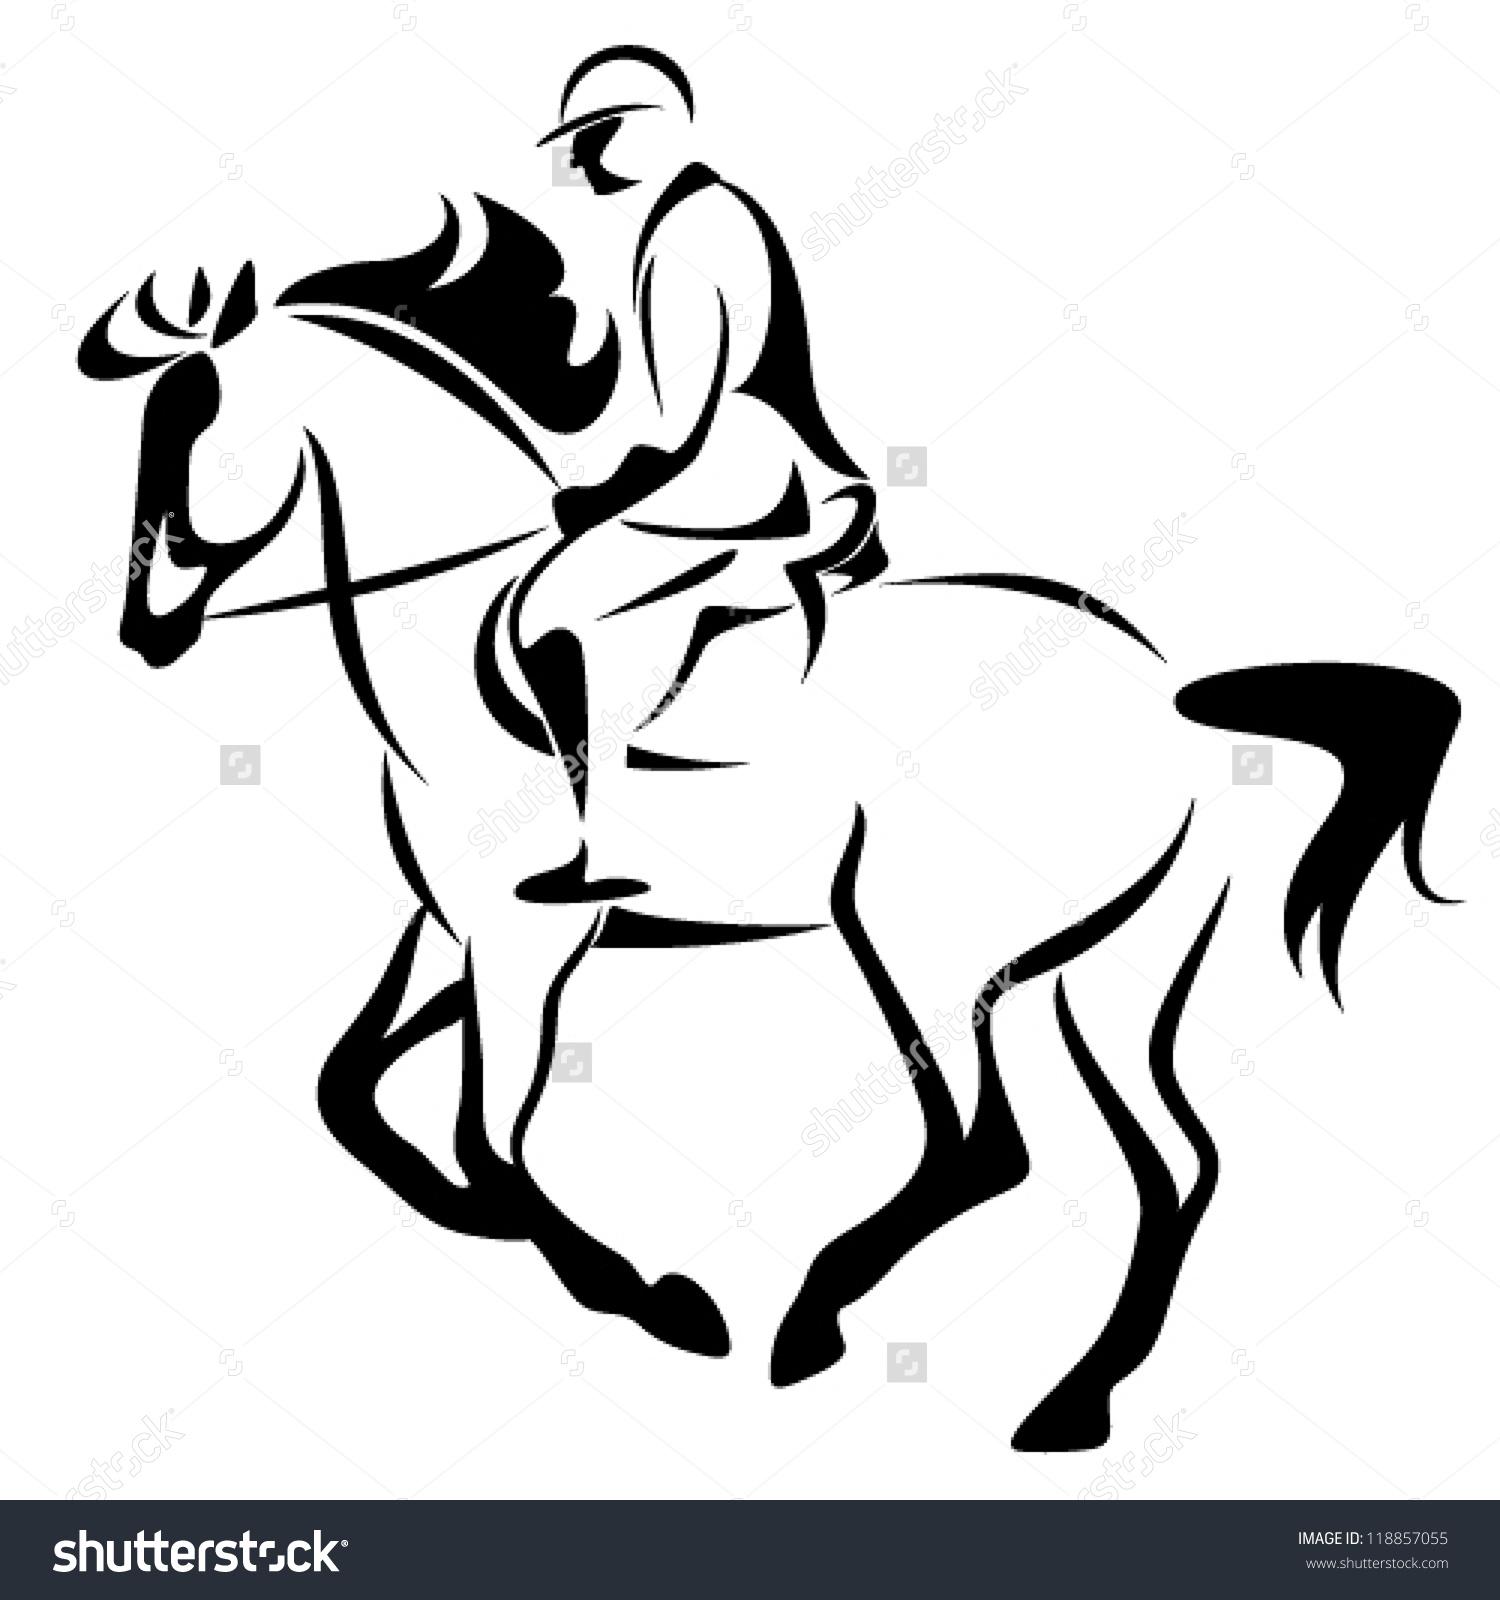 Equestrian Emblem Horse Riding Vector Illustration Stock Vector.